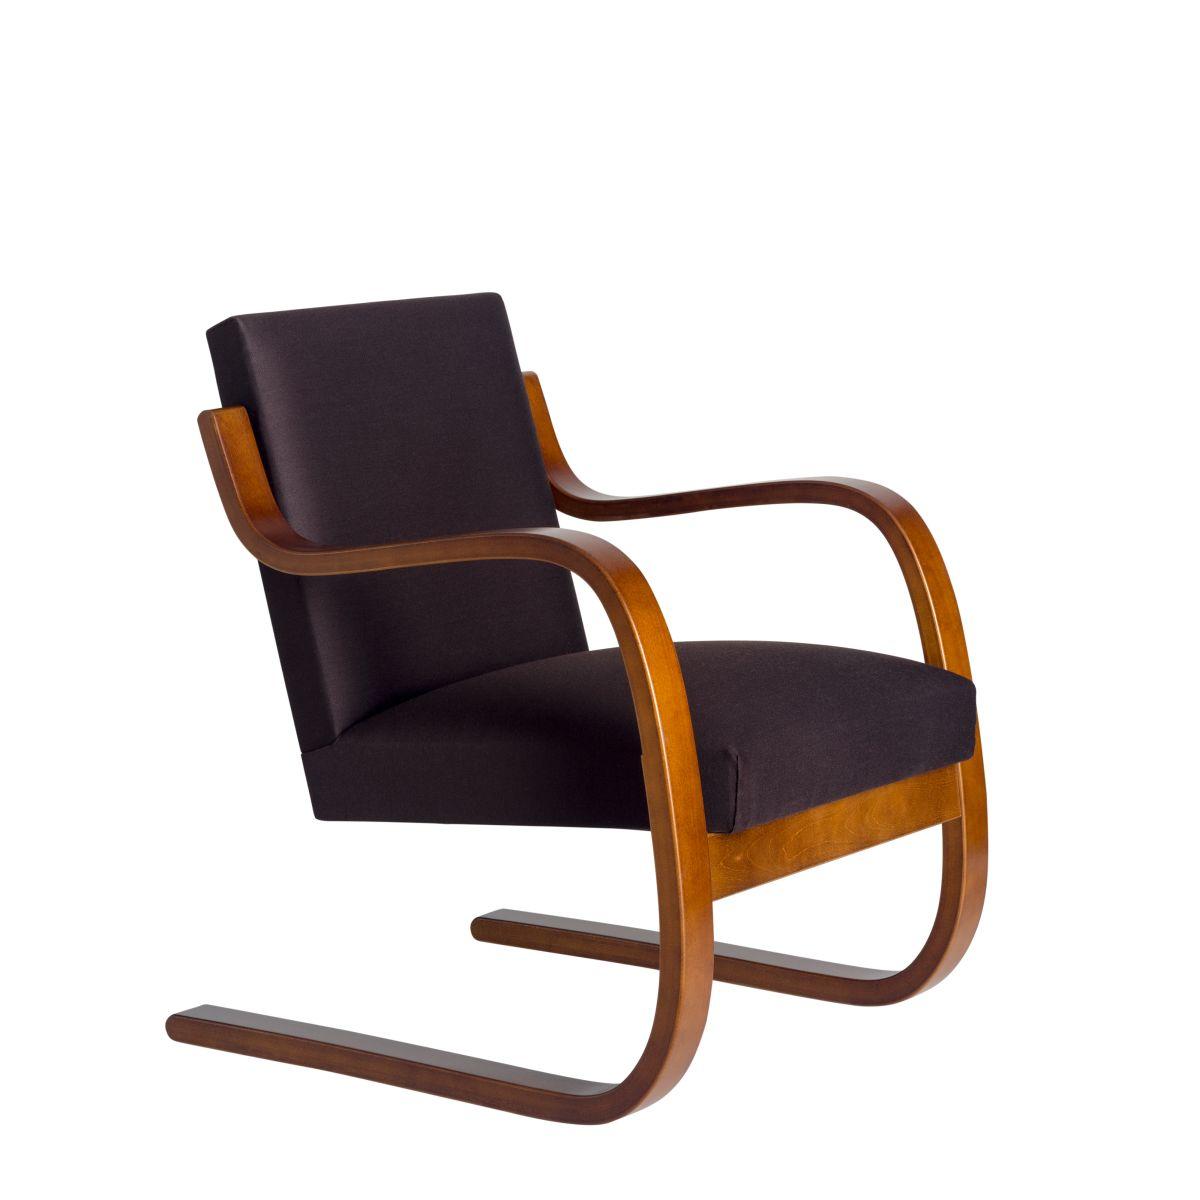 Armchair-402-Hj-Walnut-Stain-1846894